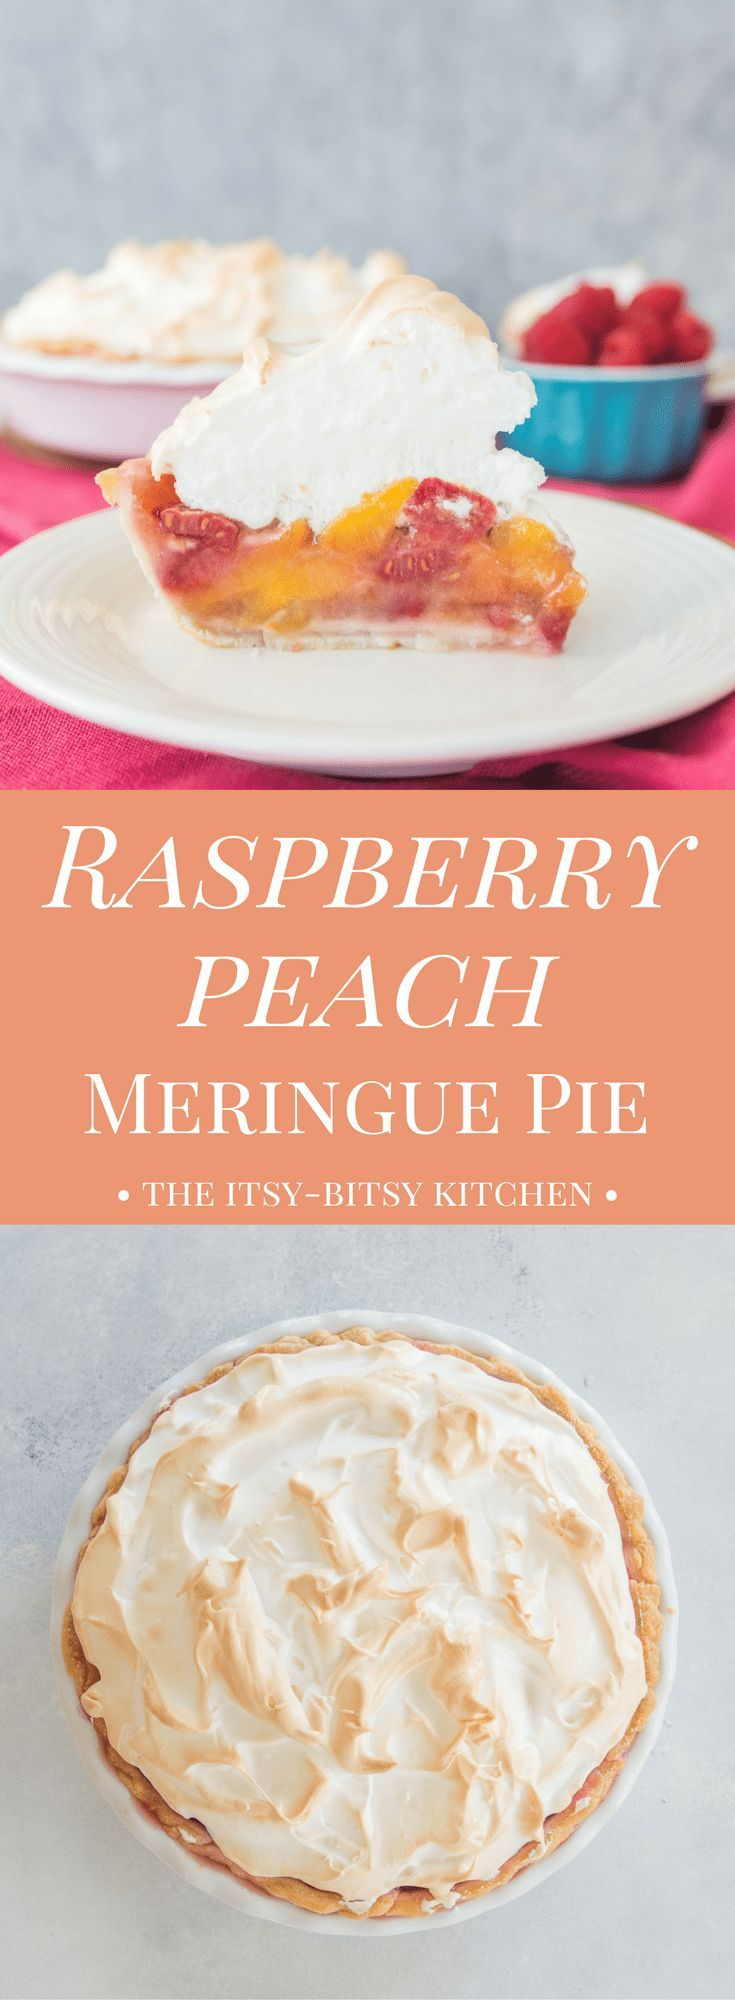 Raspberry Peach Meringue Pie